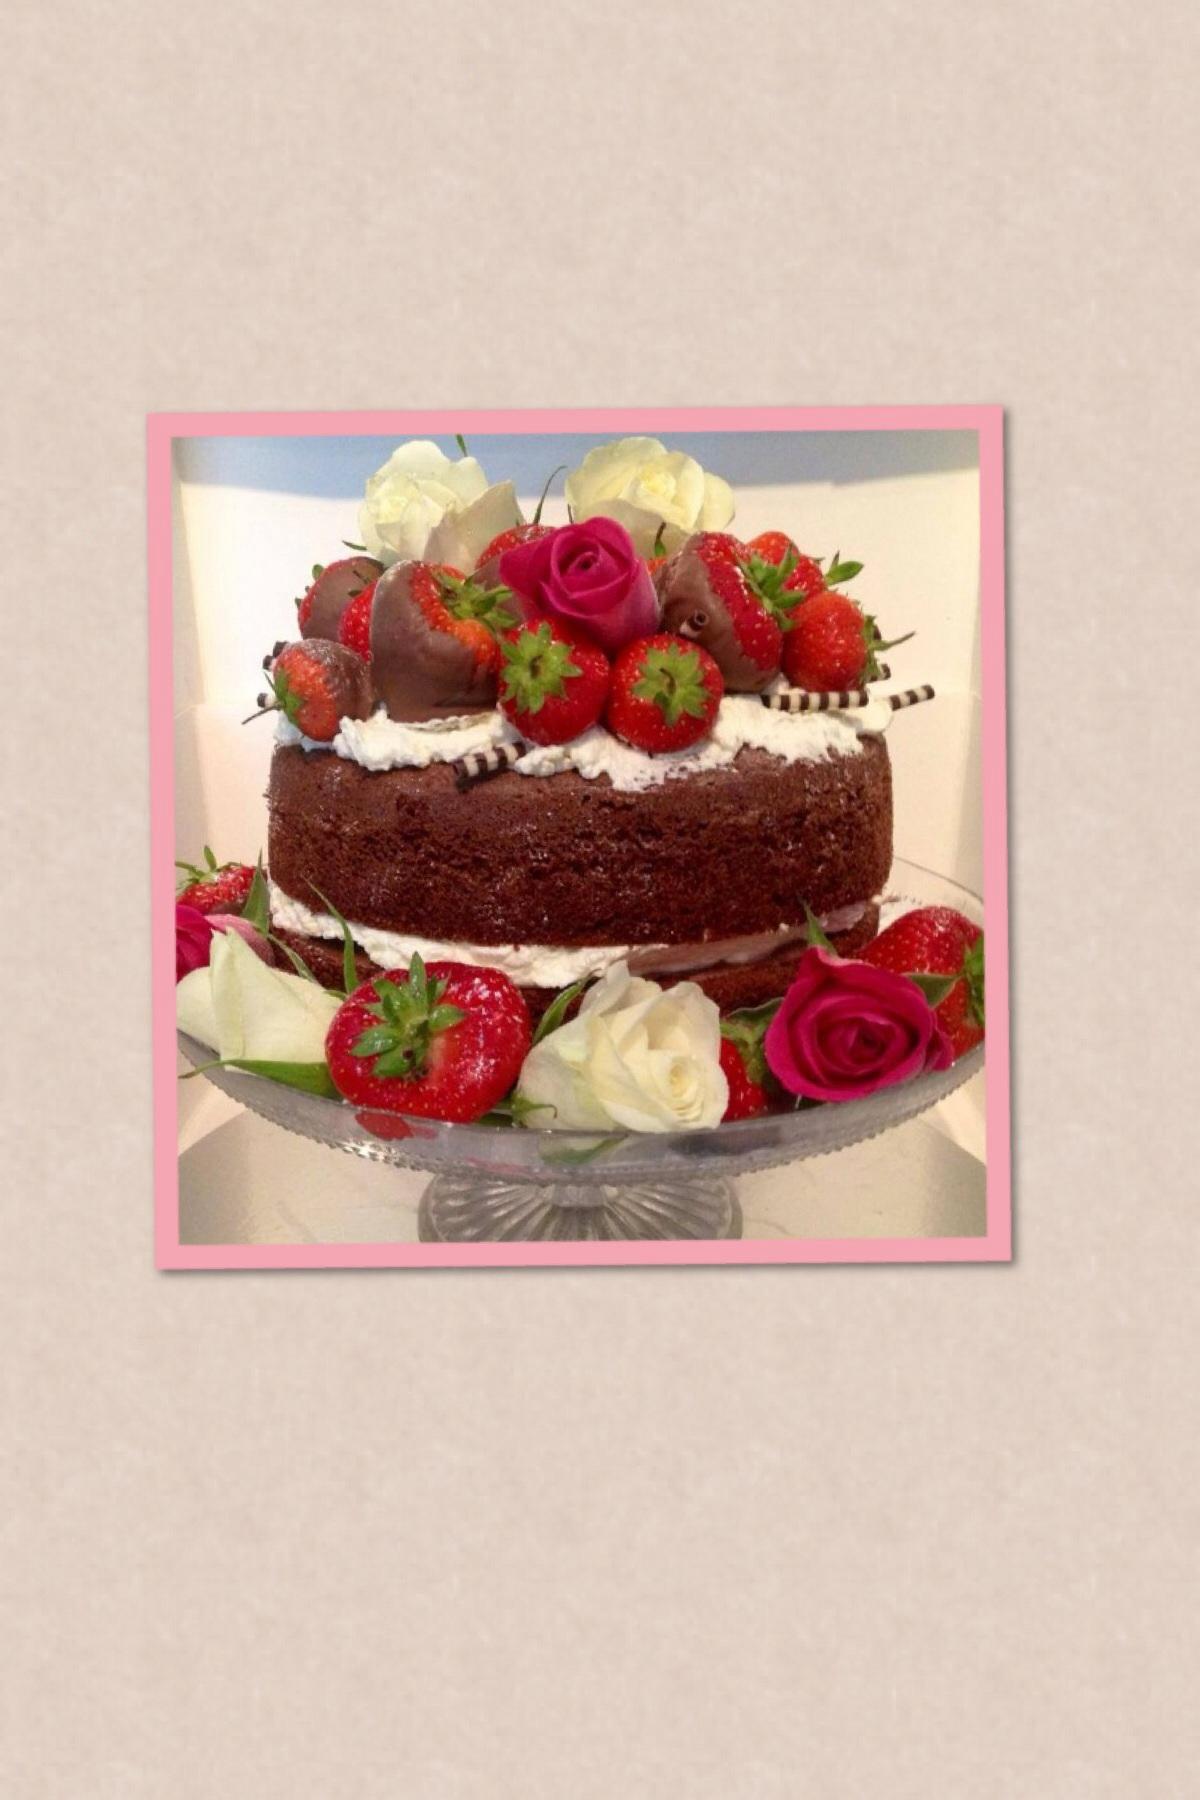 Chocolate Naked Birthday Cake The Great British Bake Off